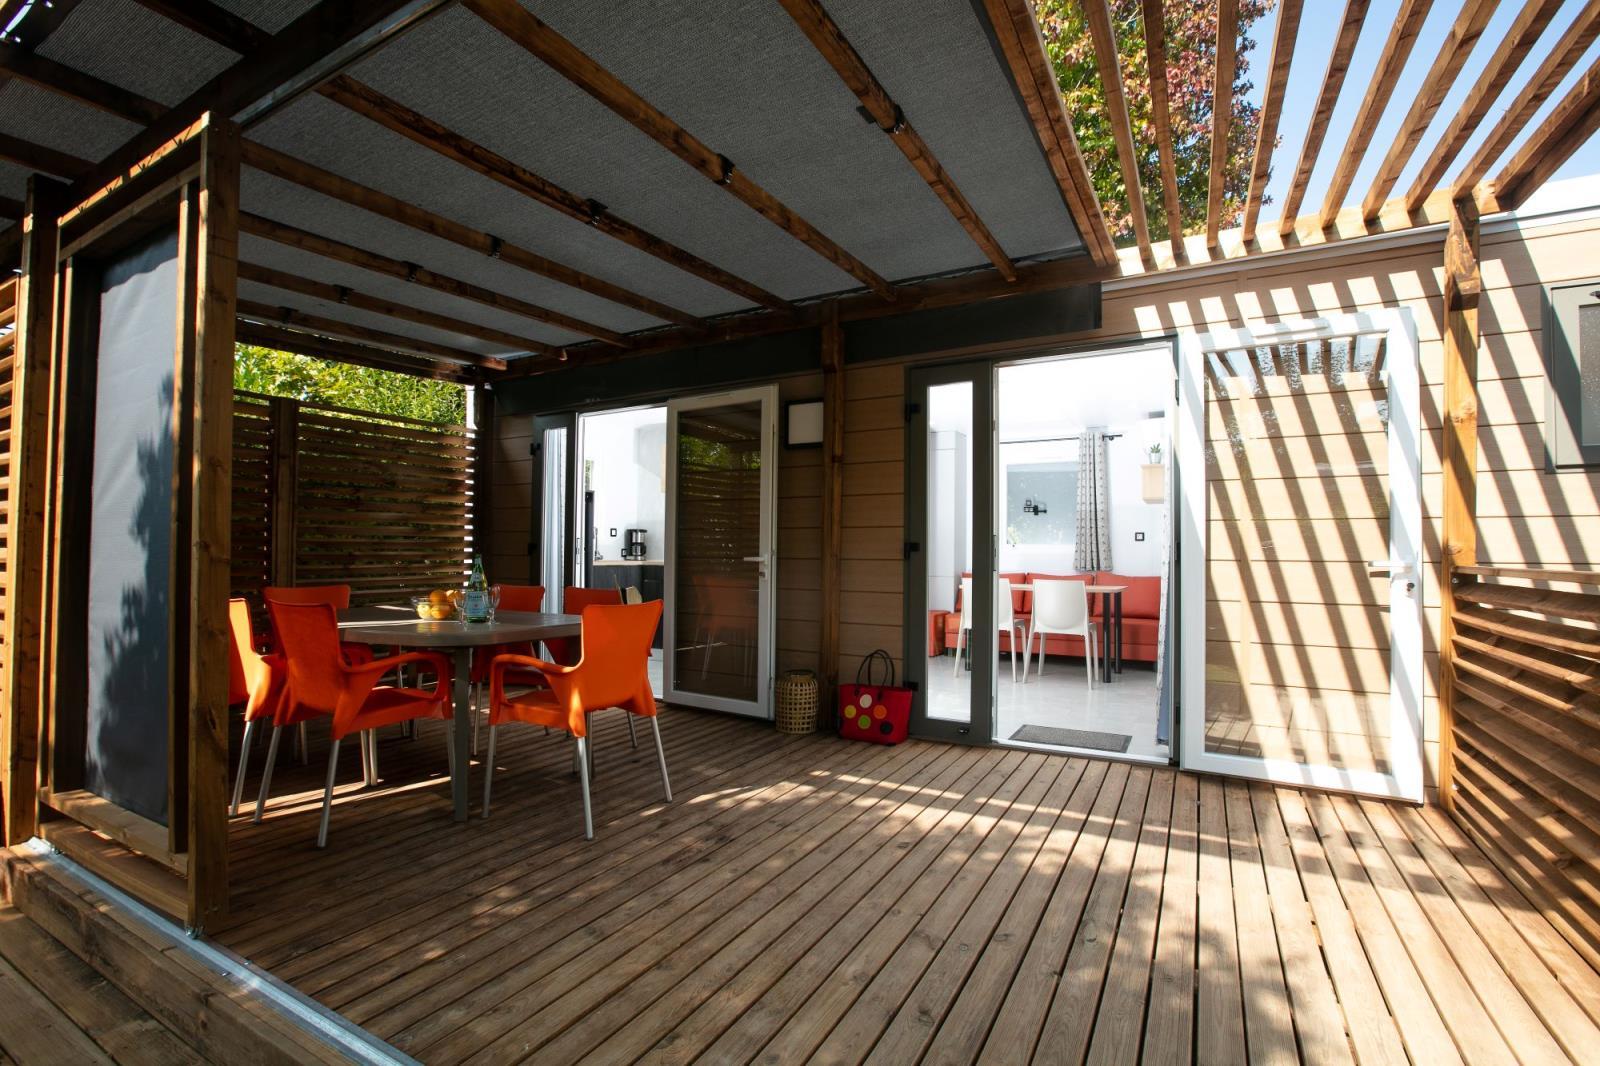 Location - Cottage Confort Plus 3 Chambres - Camping Le Paradis